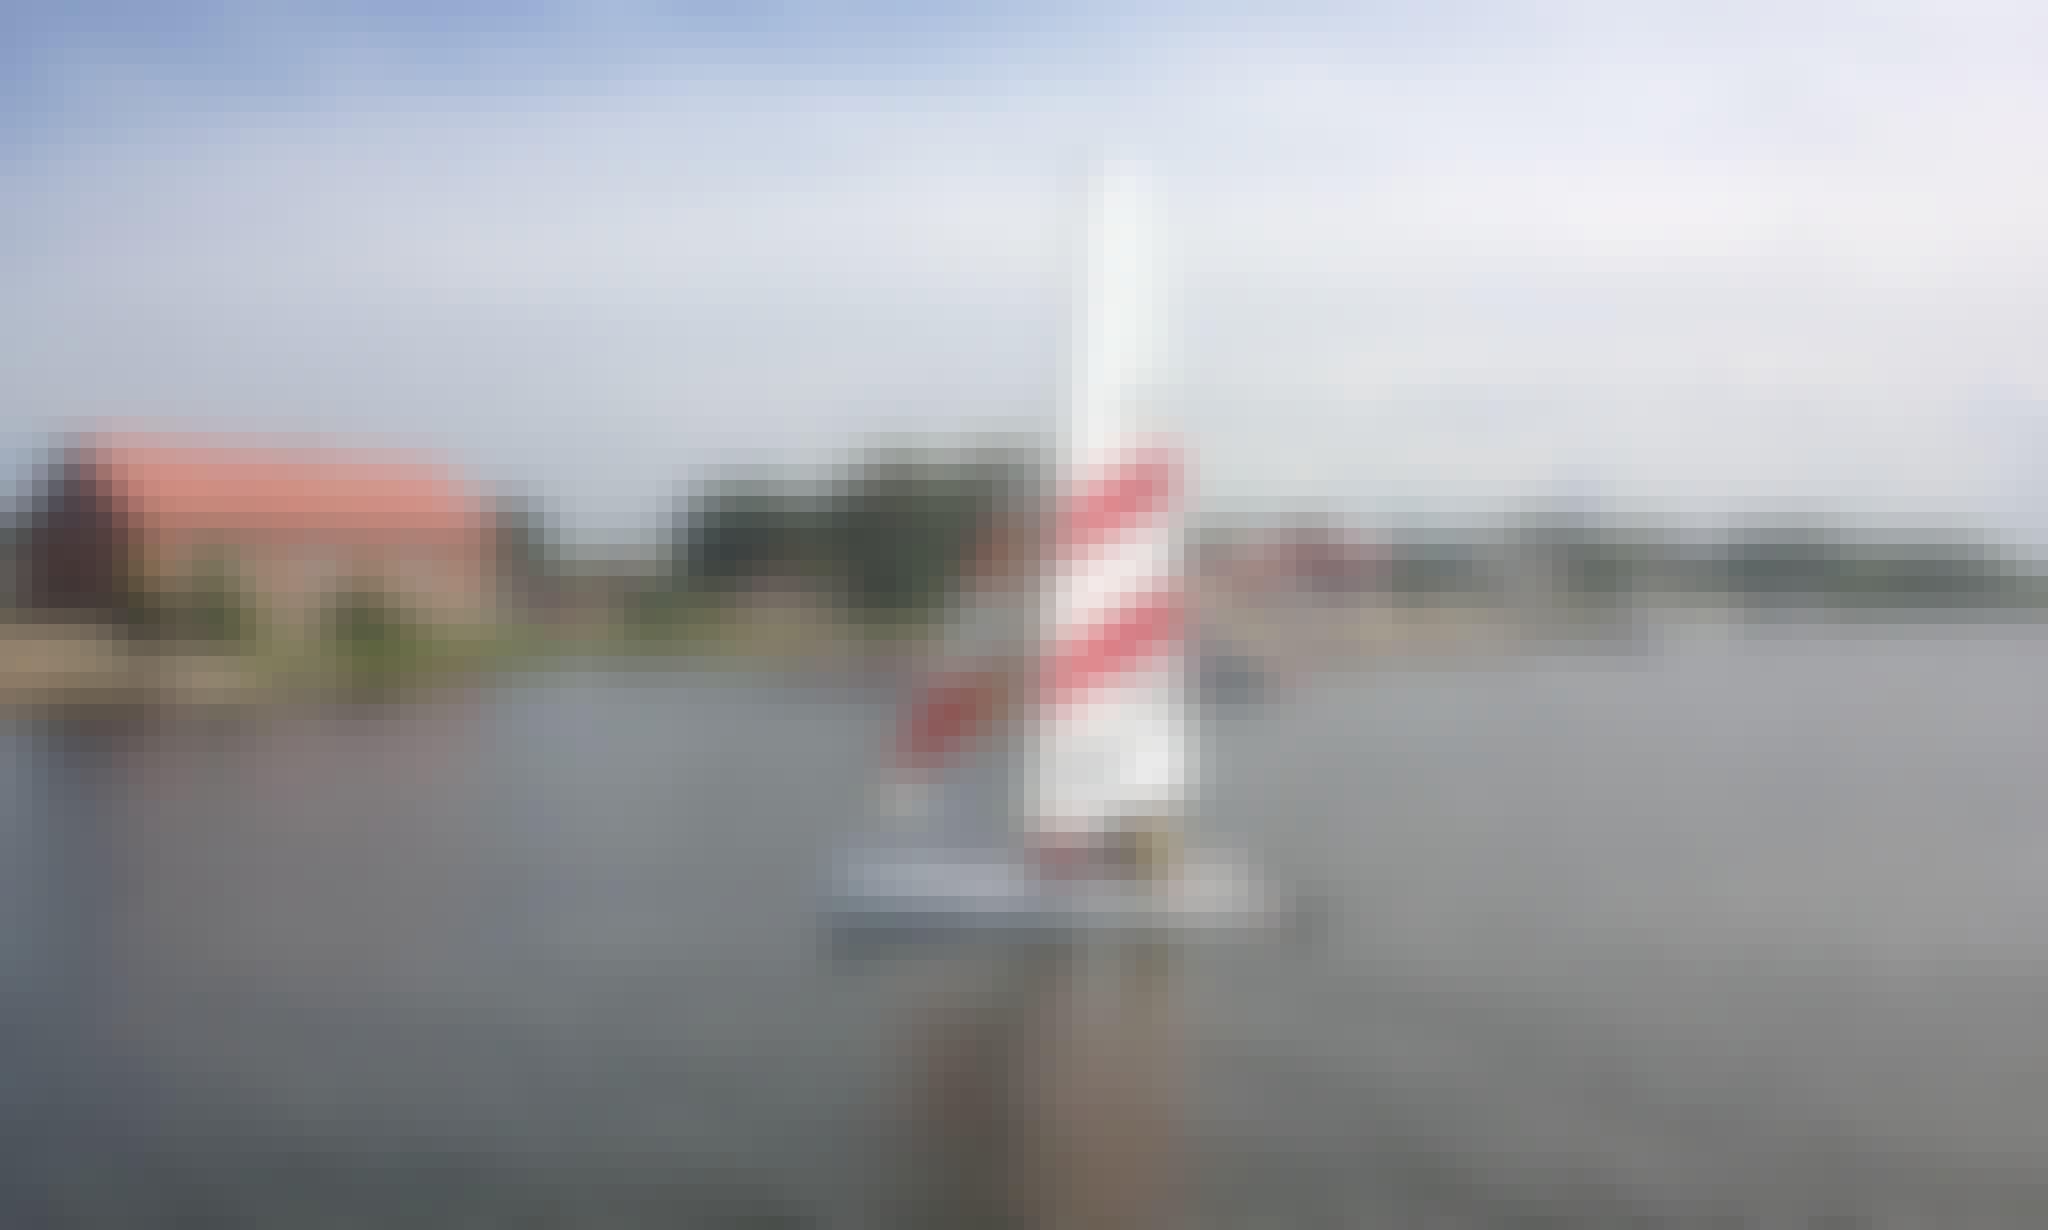 17ft TOPCAT K2 CLASSIC Beach Catamaran Rental in Pavilosta, Latvia